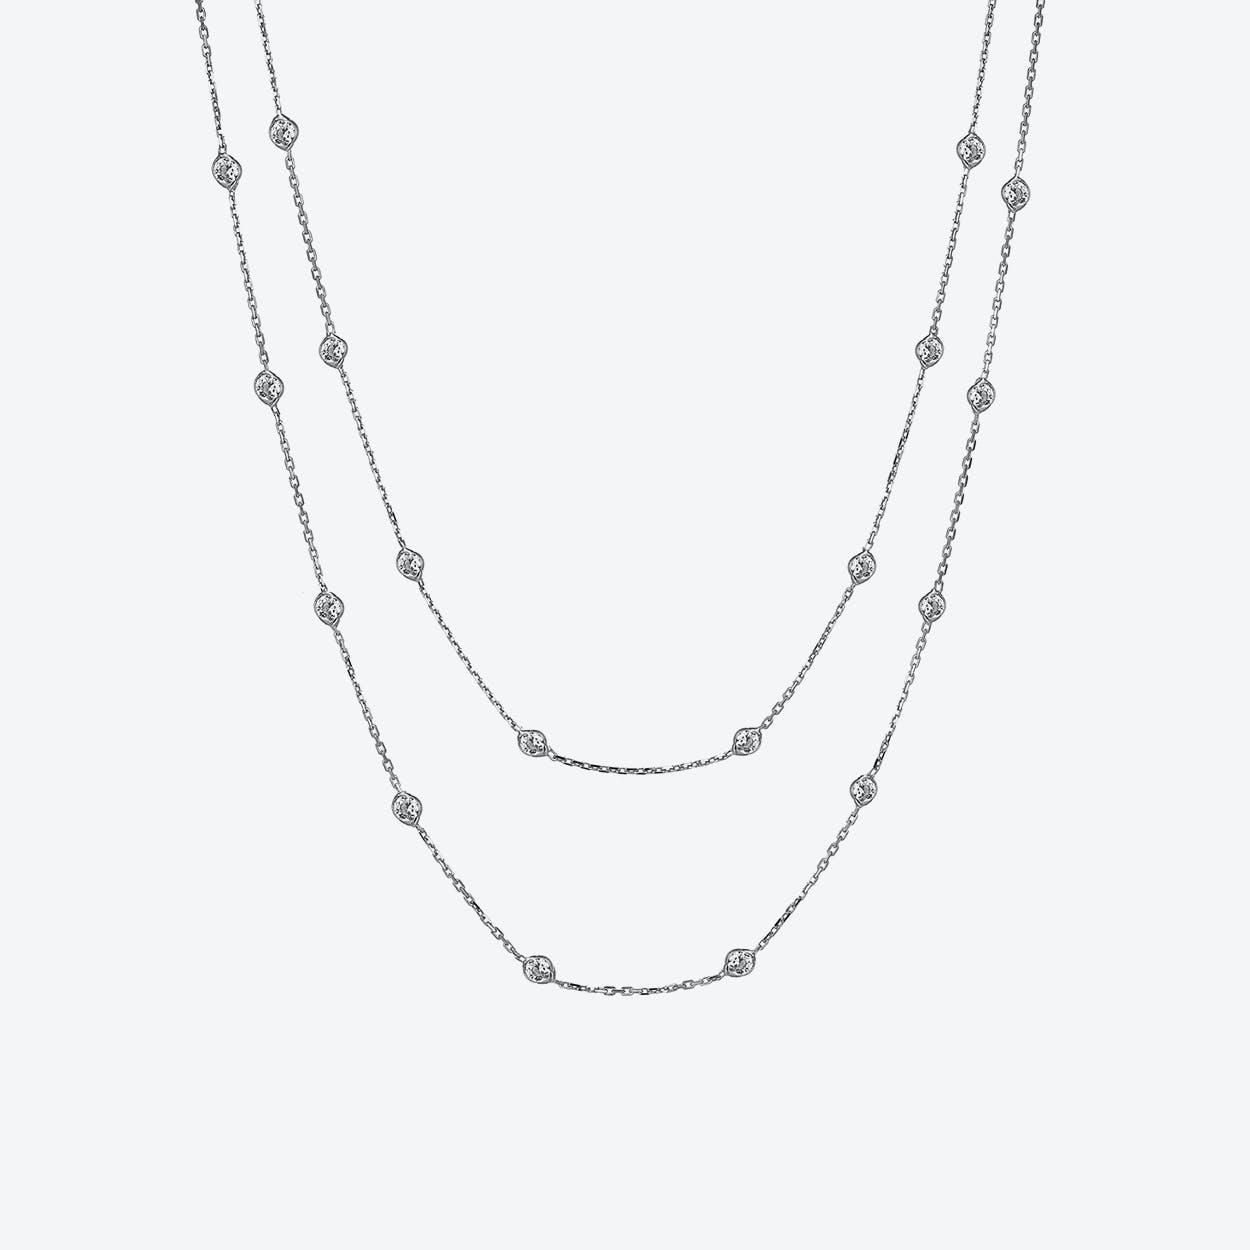 Silver Multi Solitaire Necklace